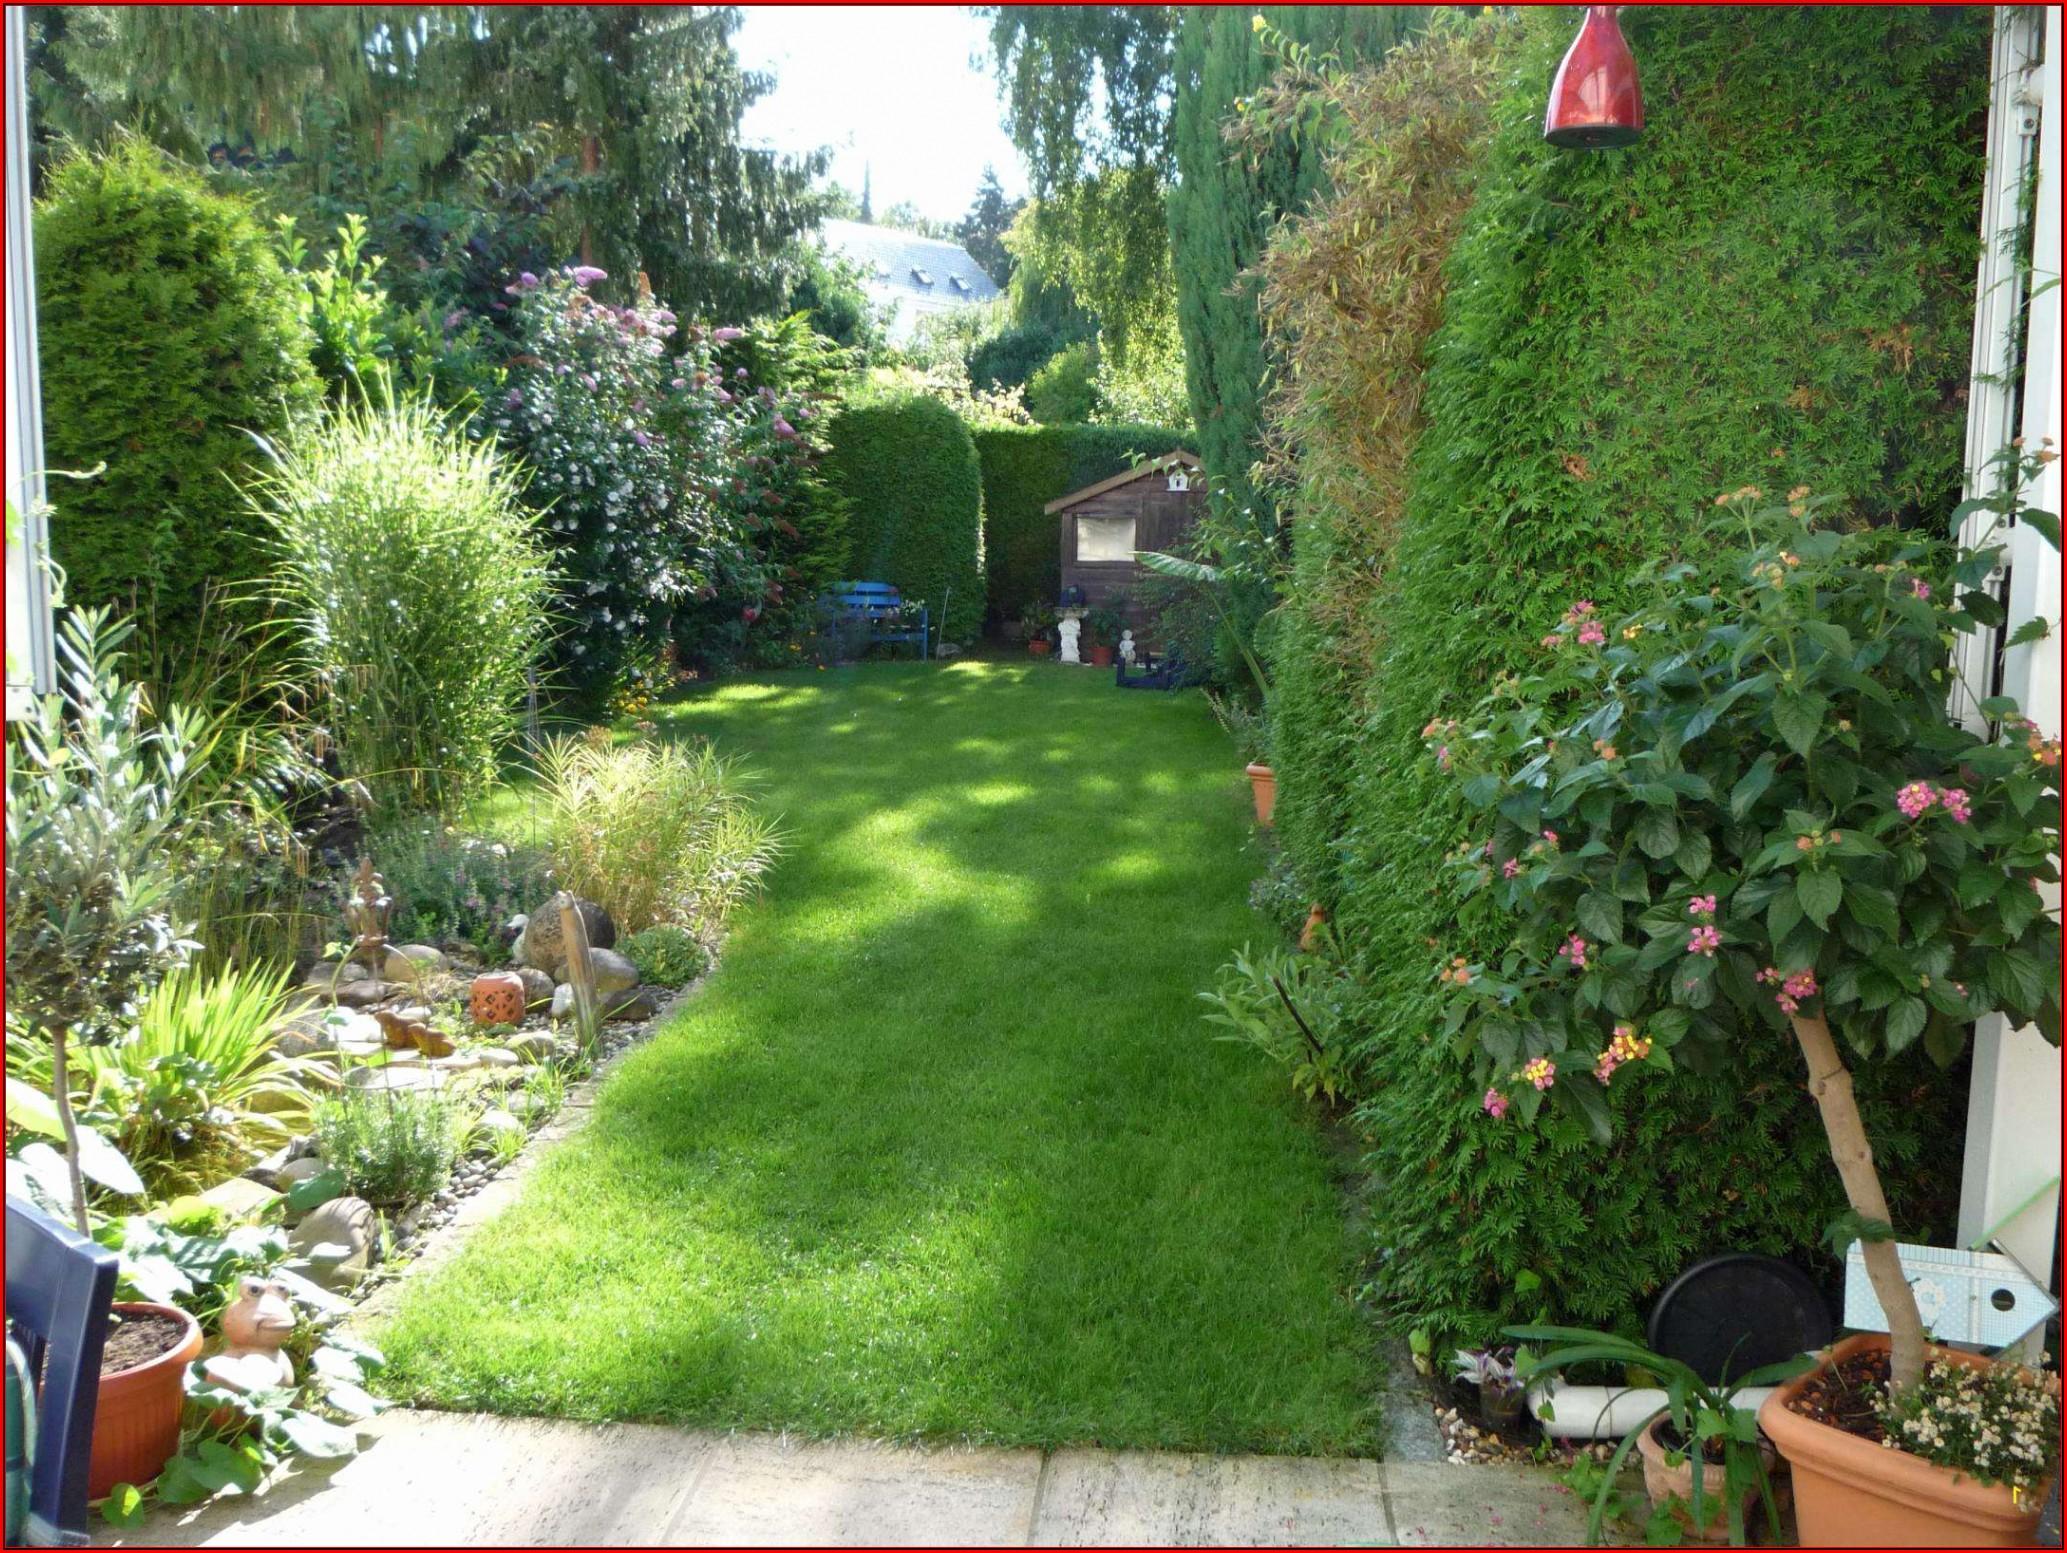 Terrasse Bepflanzen Ideen